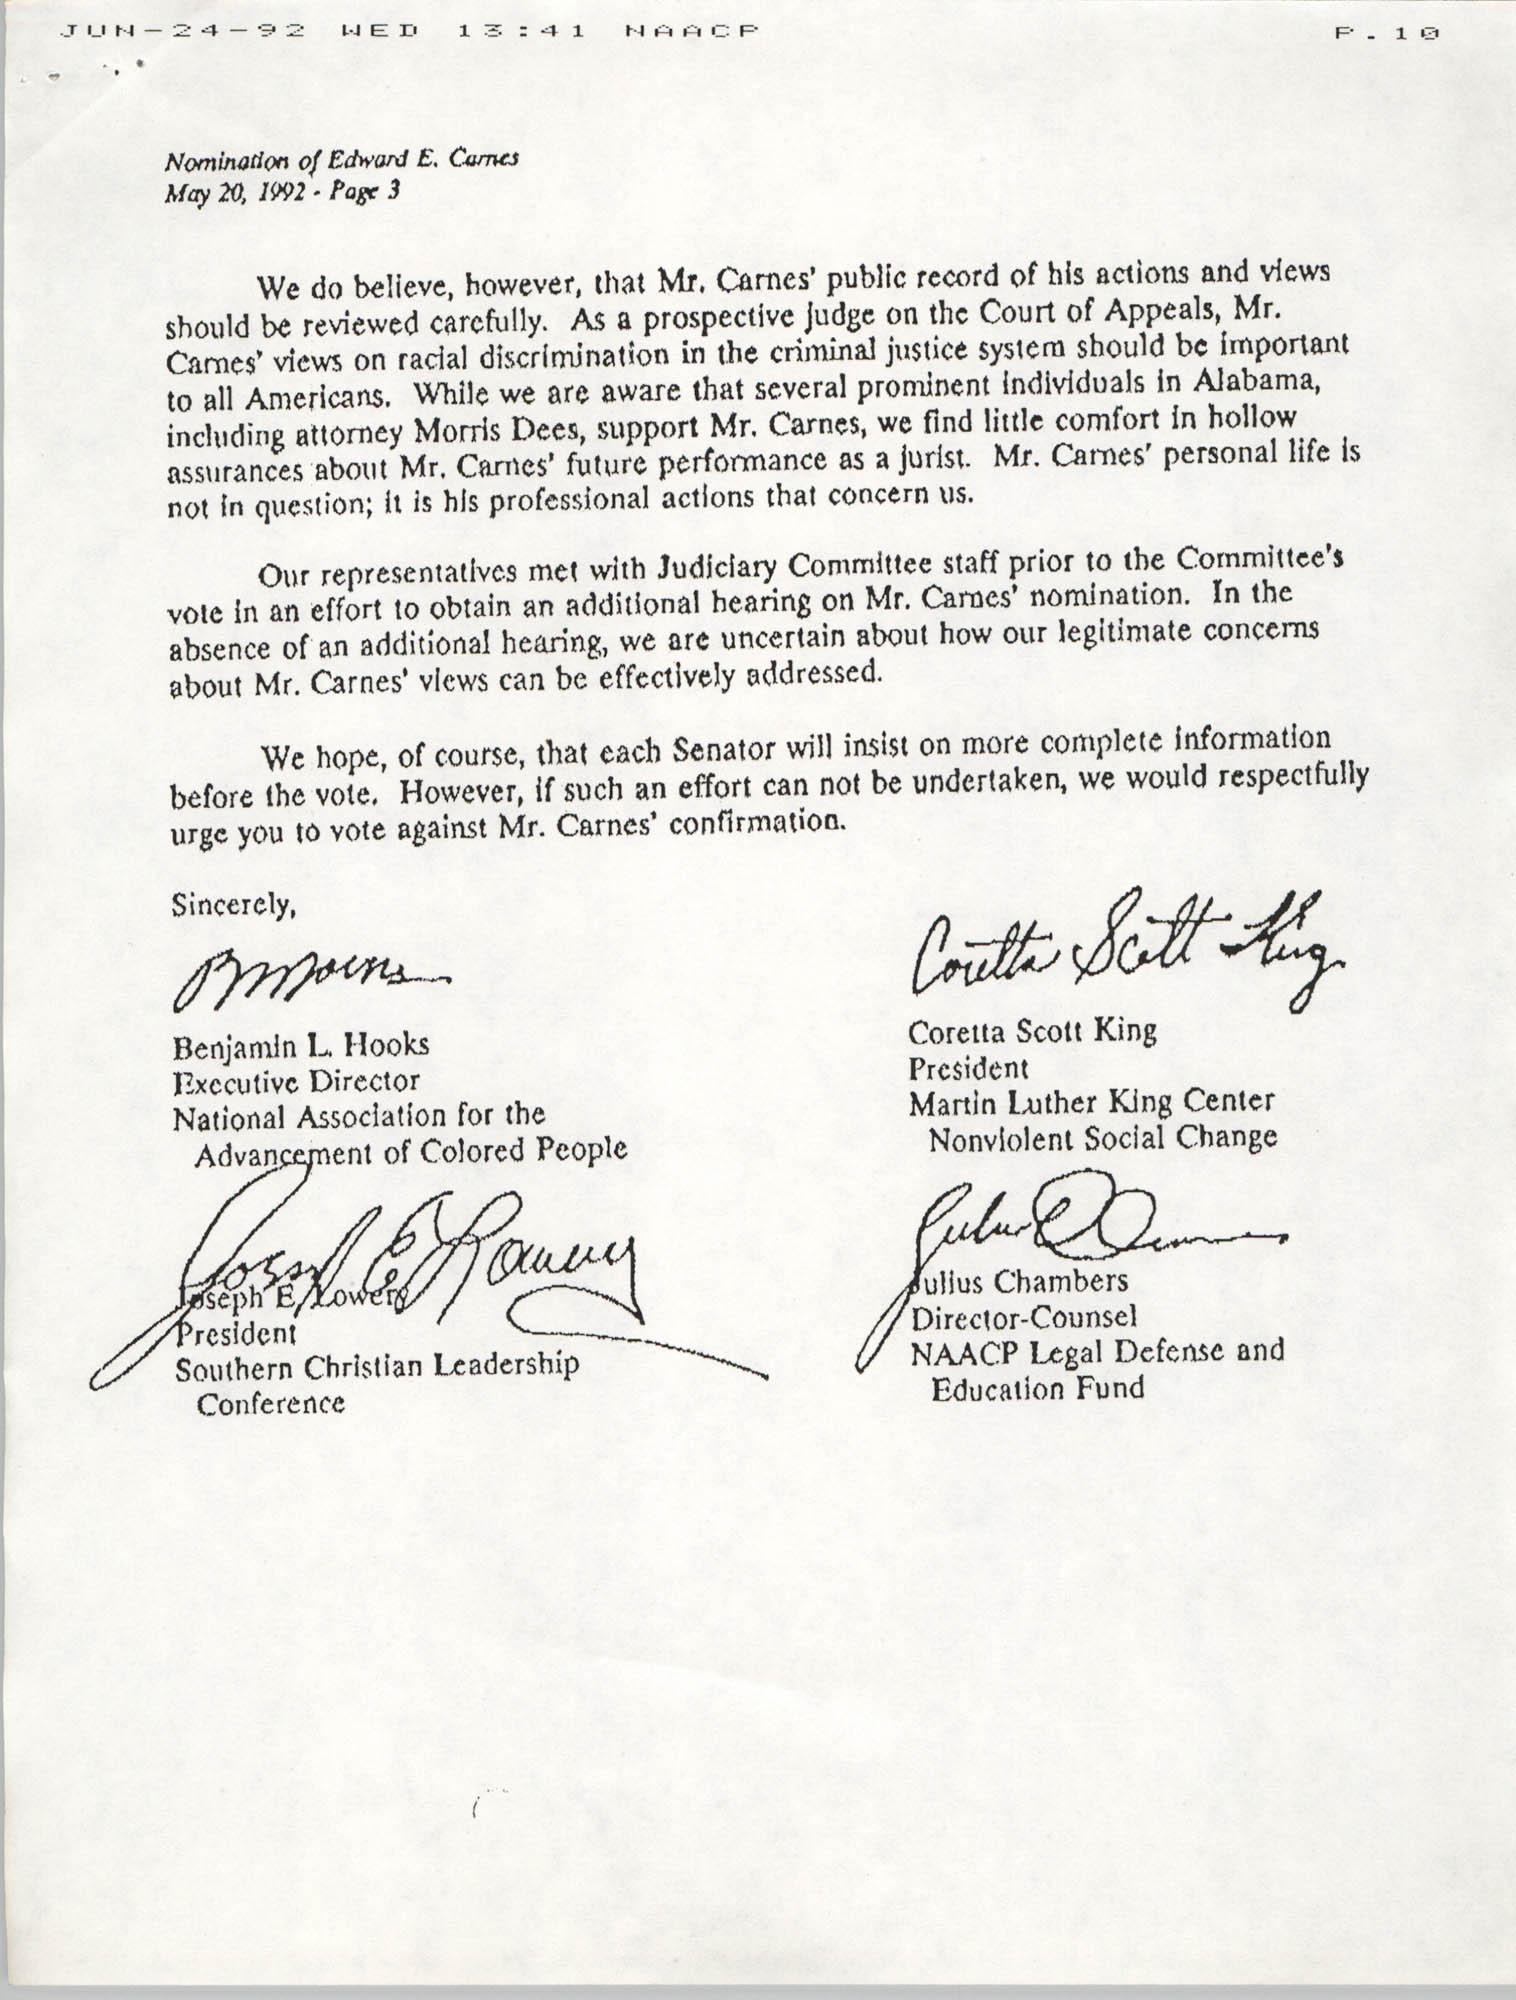 NAACP Washington Bureau Memorandum, June 19, 1992, Page 10